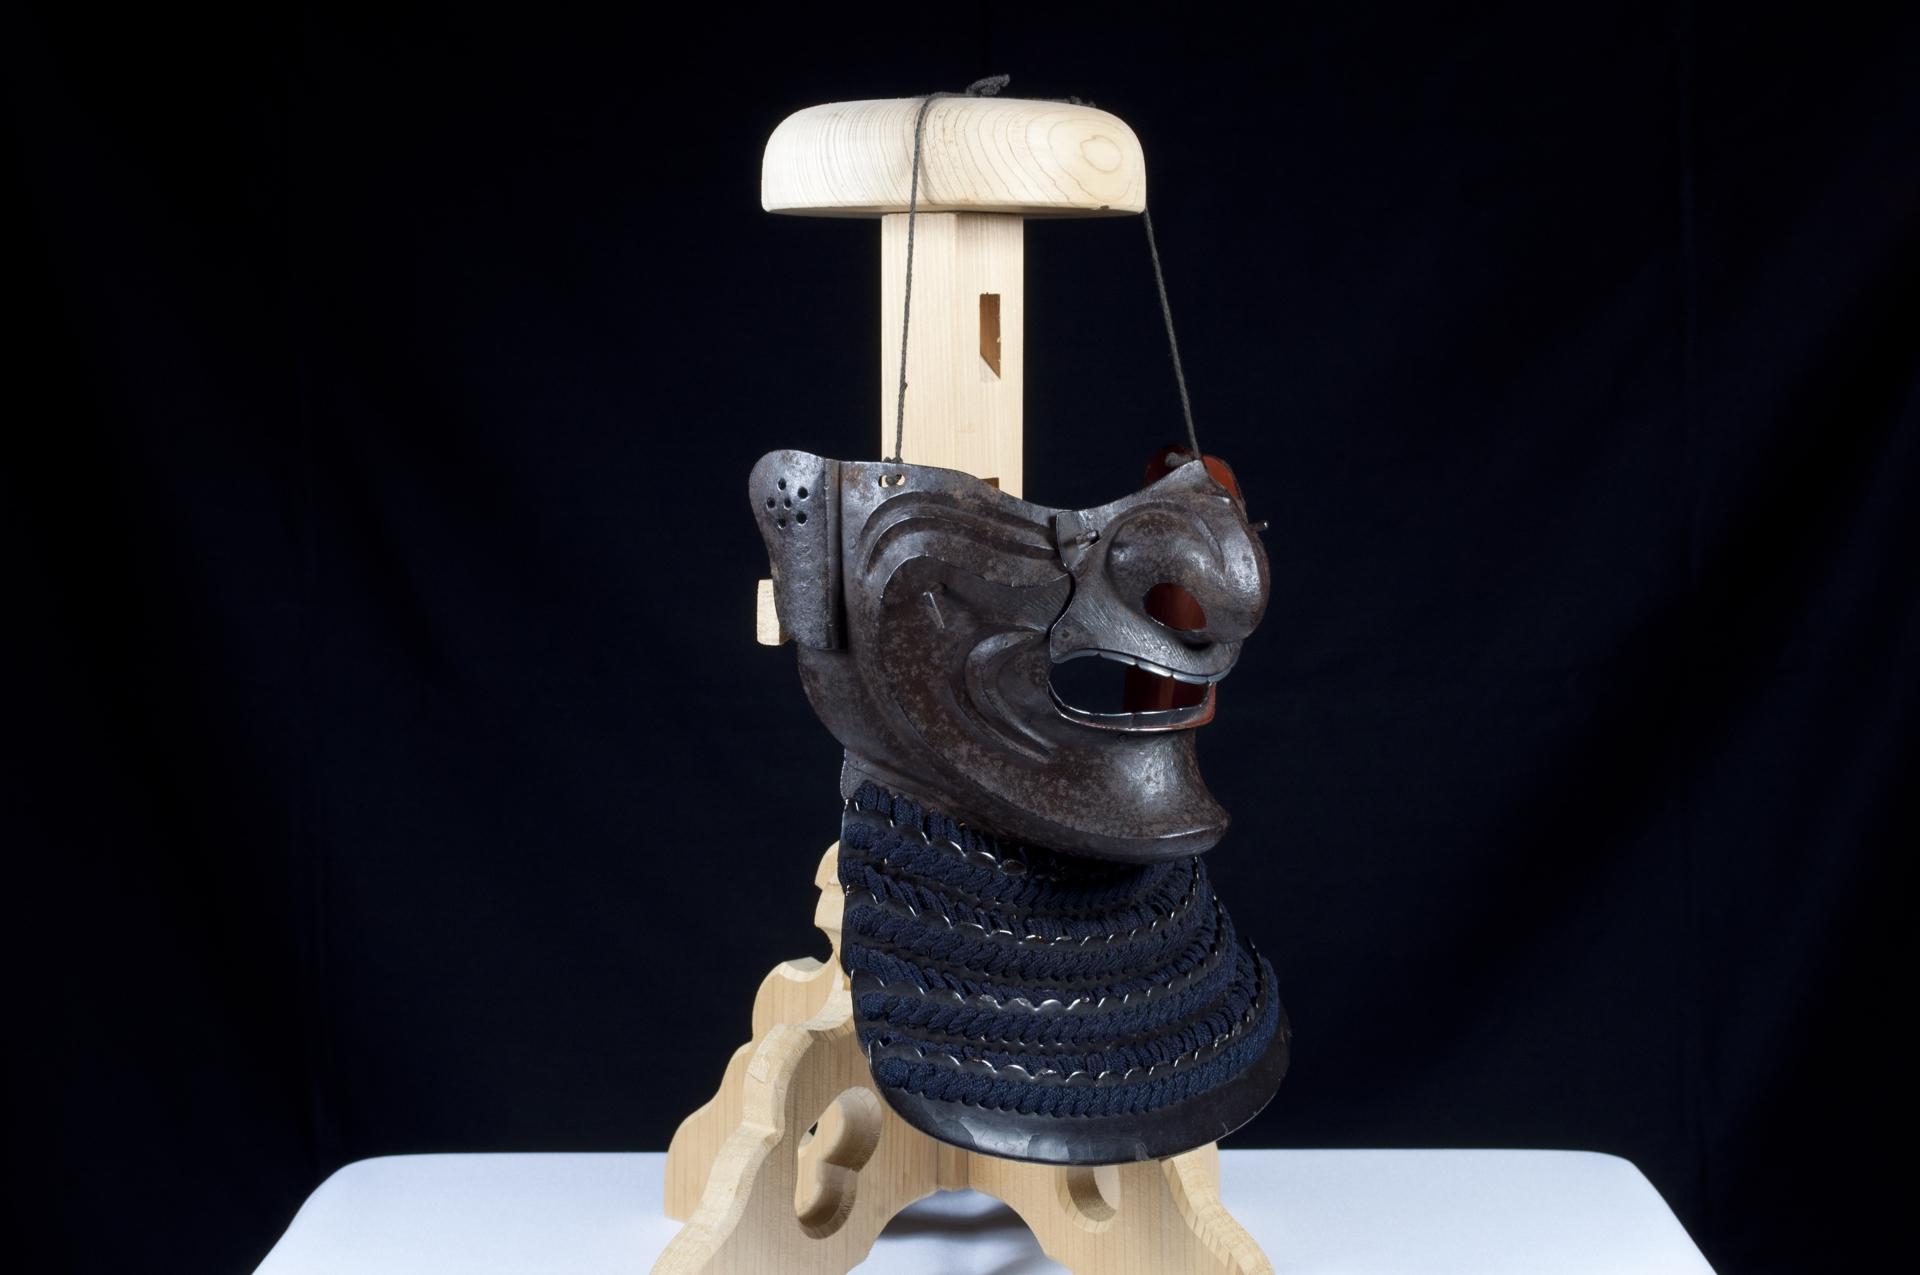 Menpo Reissei fer naturel Edo Armure Yoroi (3)